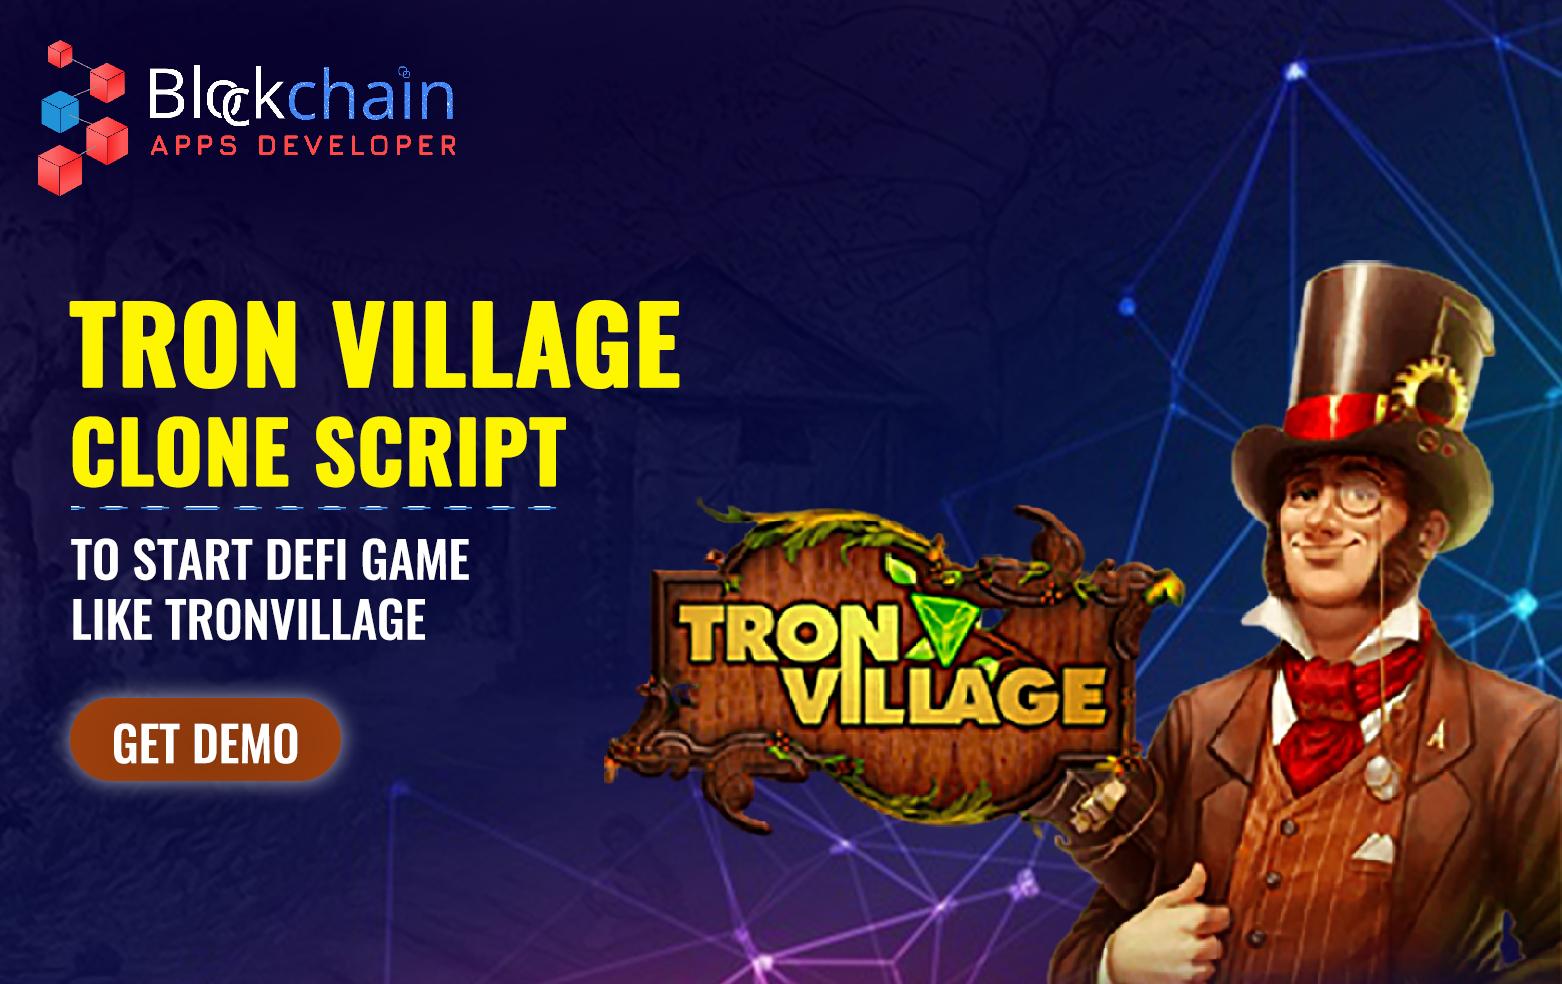 Tron Village Clone Script To Launch DeFi Game Like TronVillage